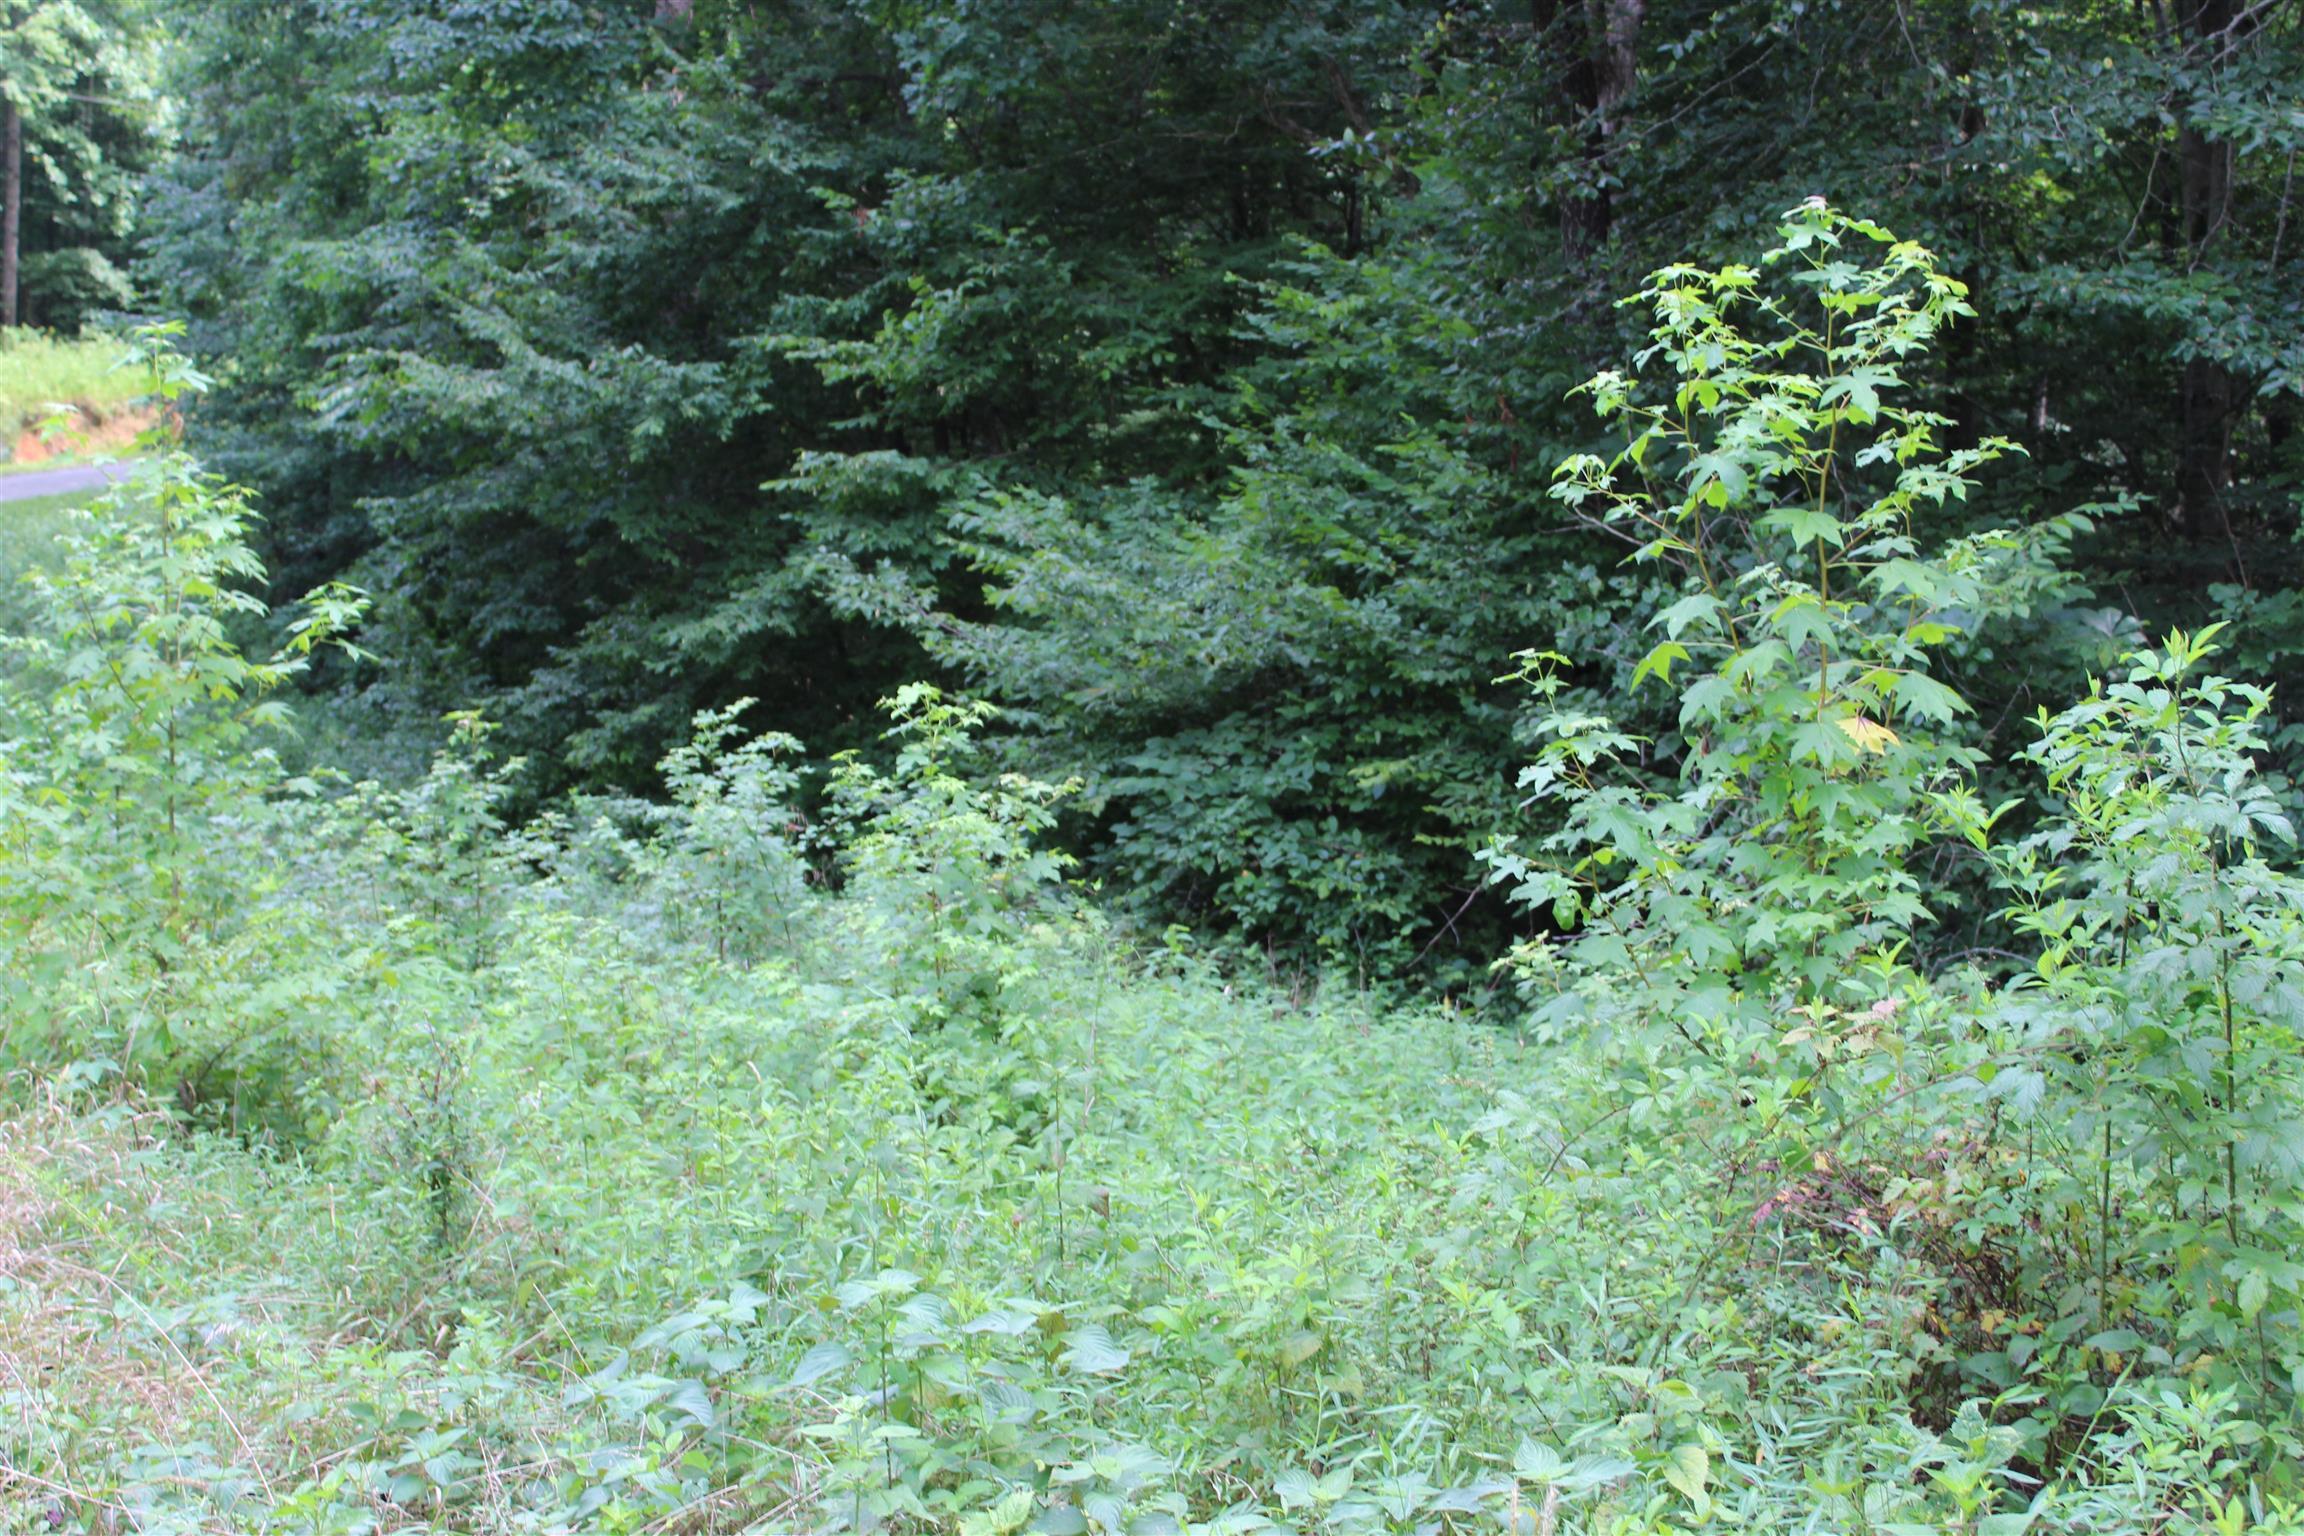 18 Patricia Cir, Indian Mound, TN 37079 - Indian Mound, TN real estate listing